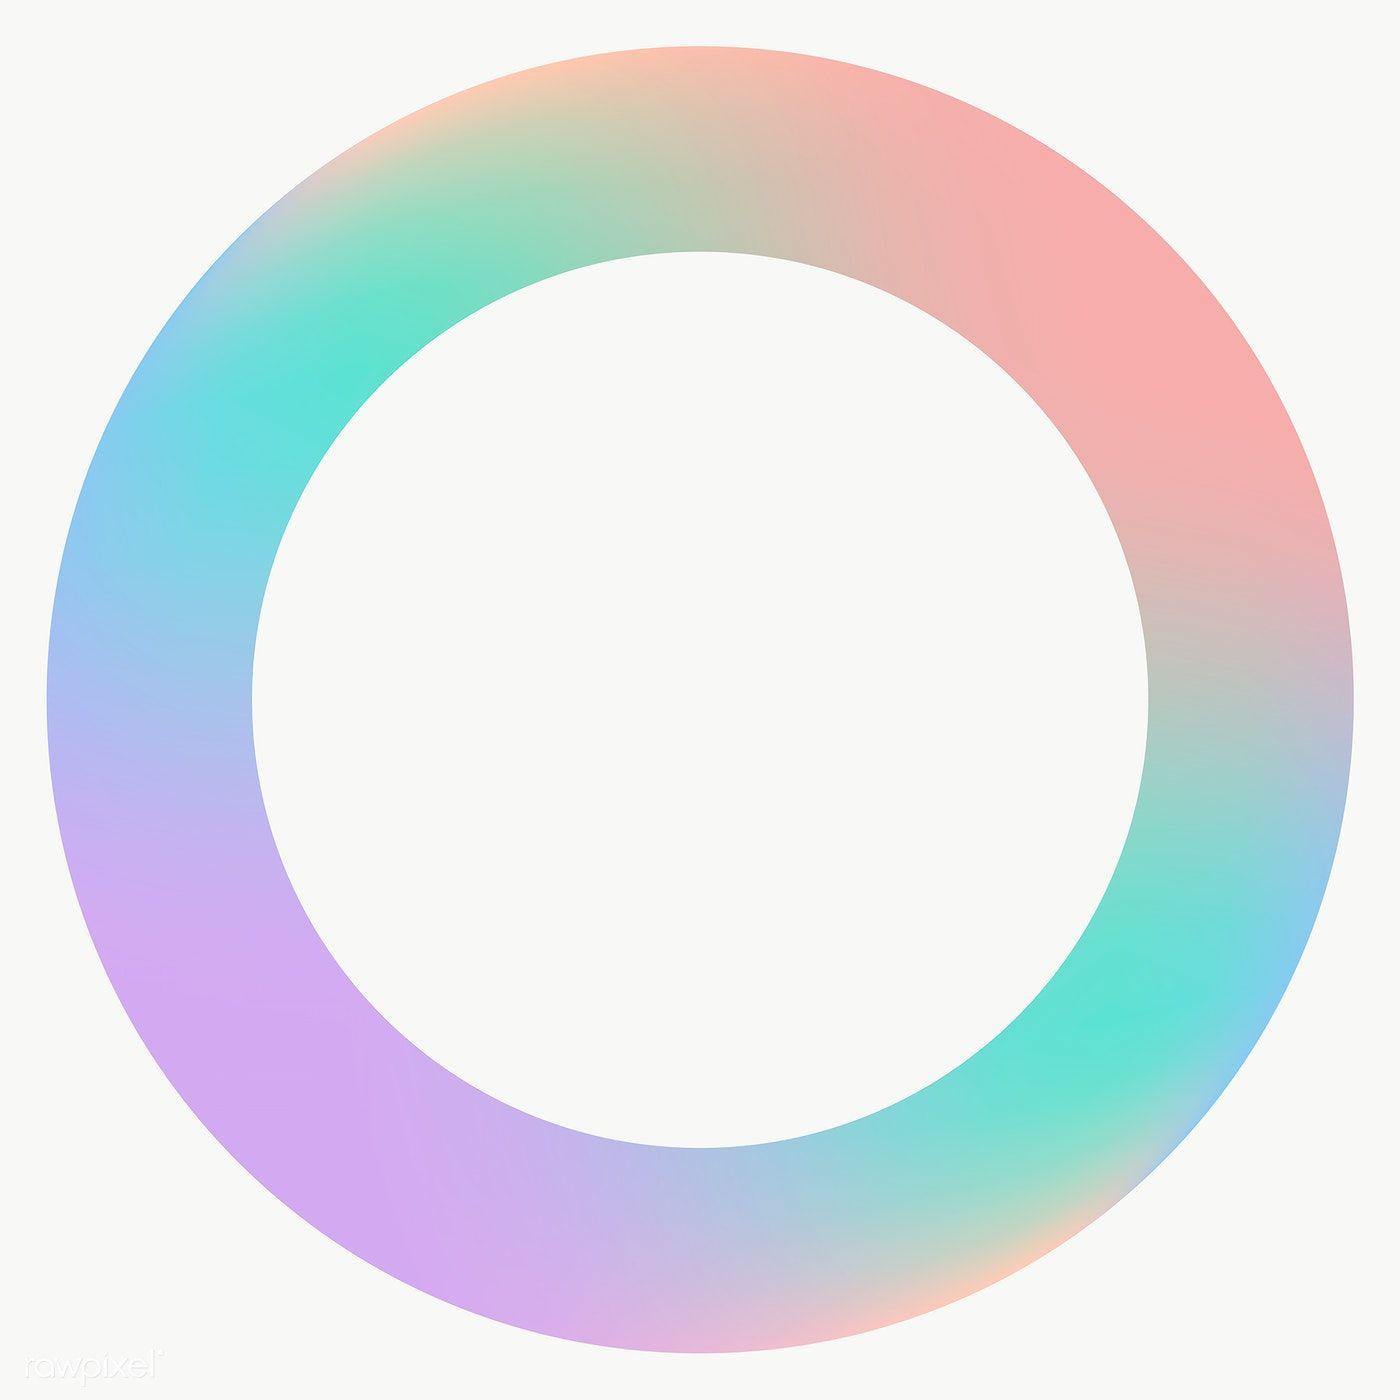 Colorful Ring Gradient Element Transparent Png Premium Image By Rawpixel Com Nunny Png Free Design Resources Gradient